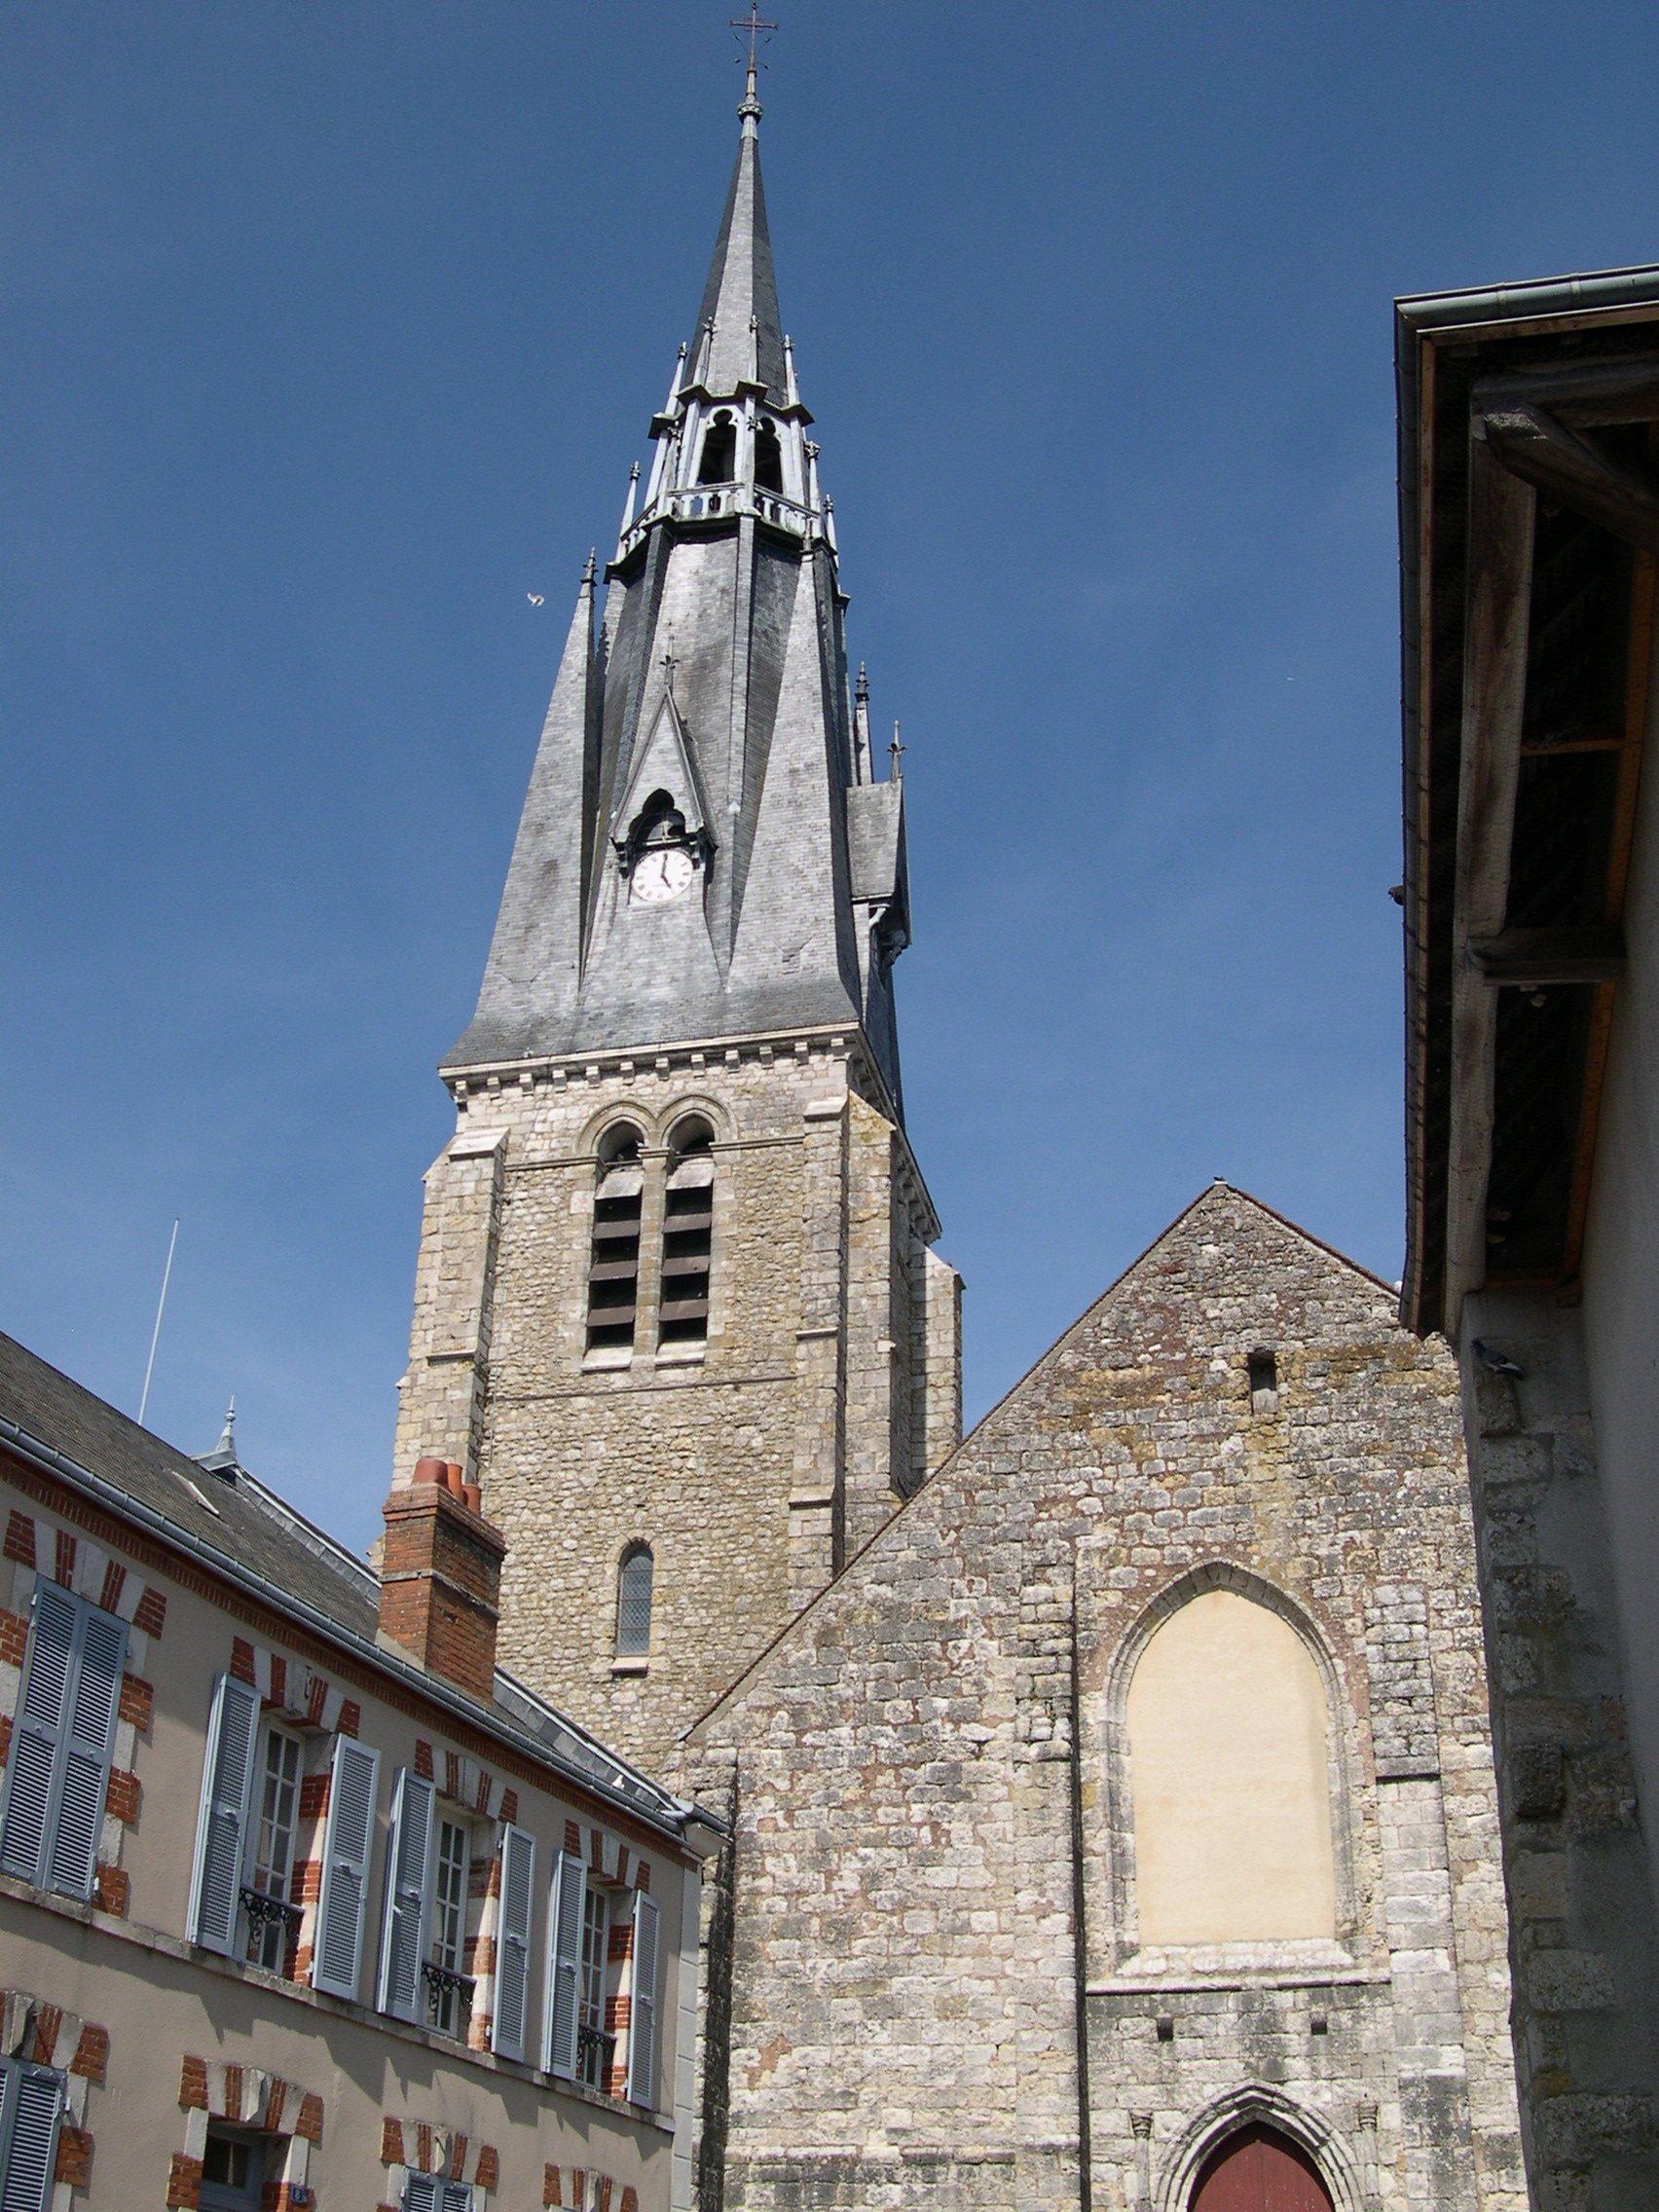 Beaune-la-Rolande